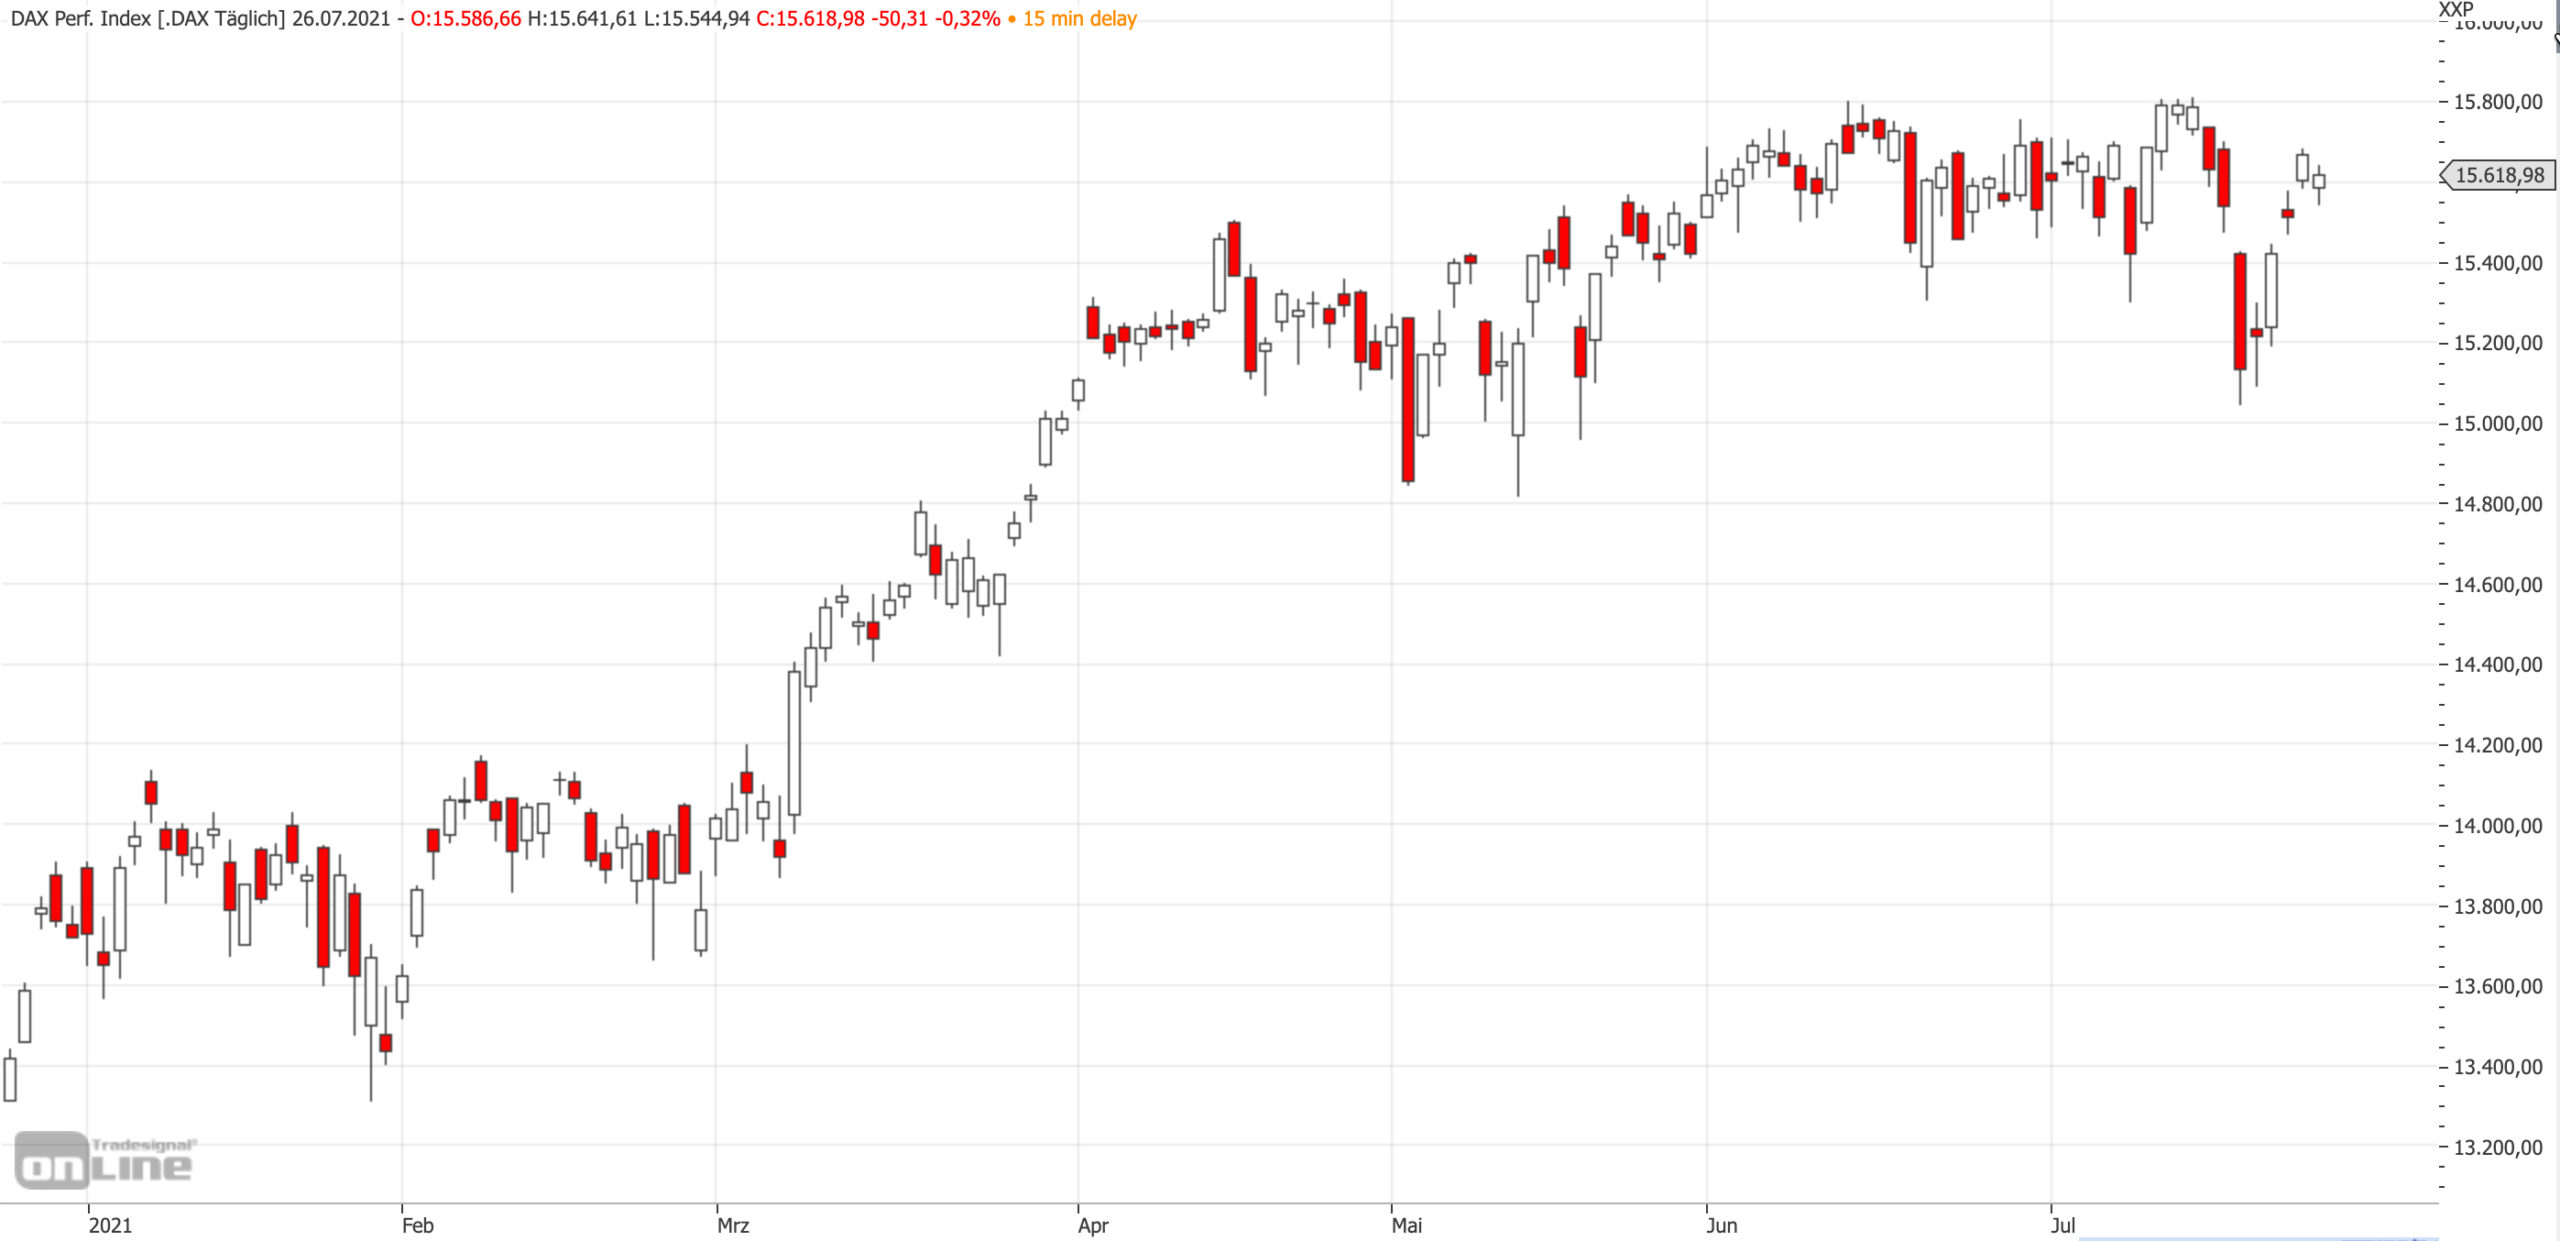 Mittelfristiger DAX-Chart am 26.07.2021